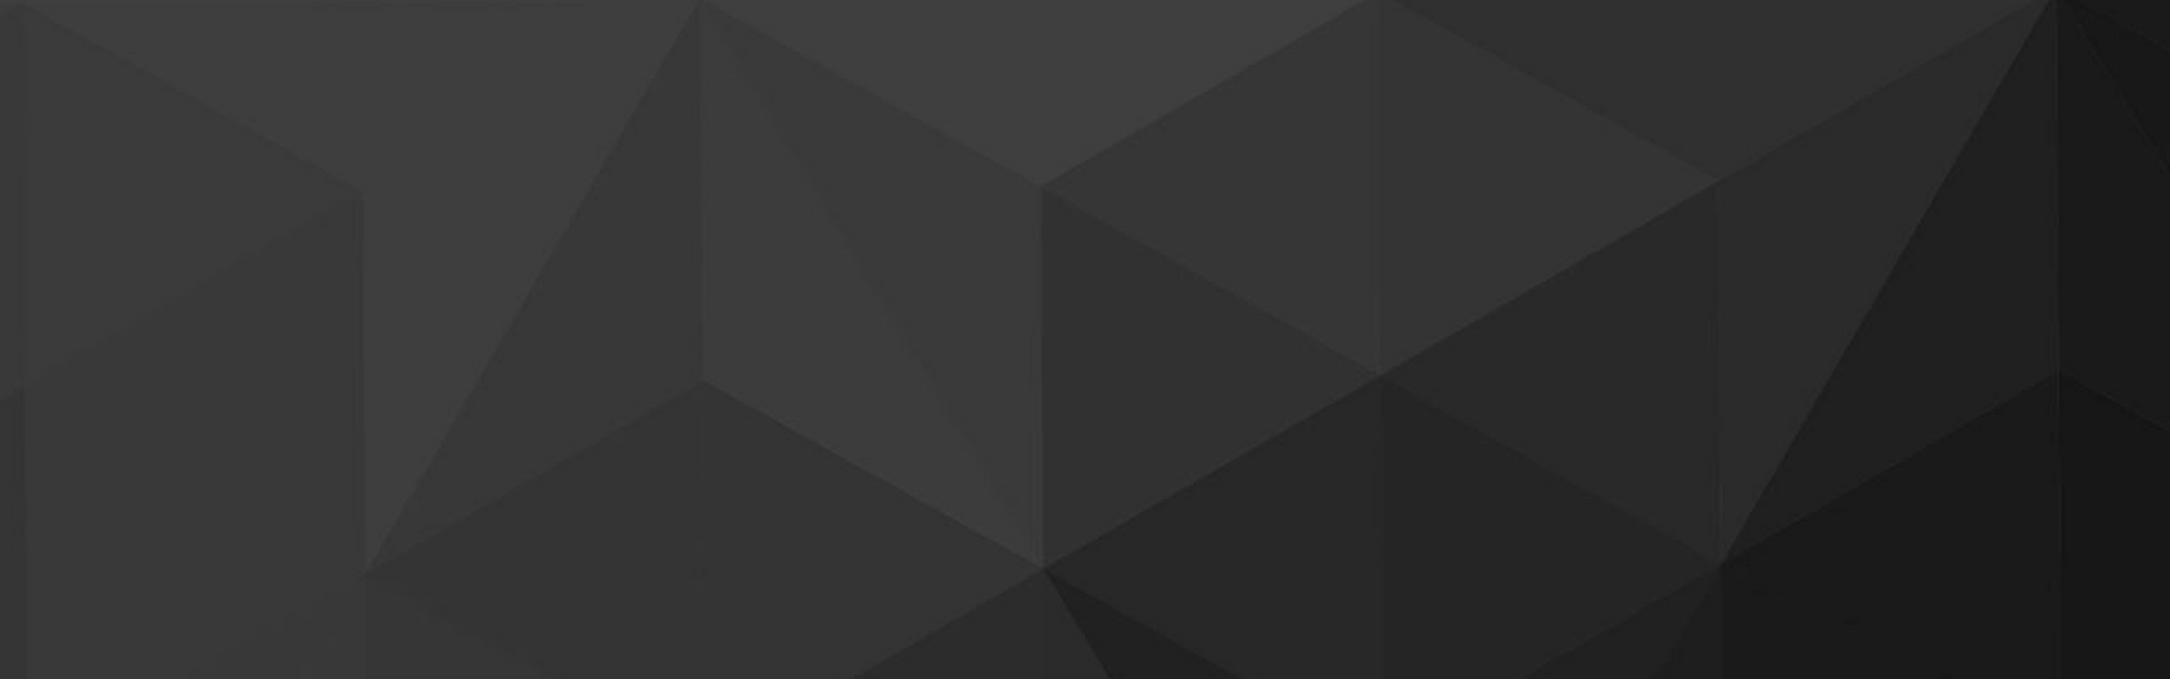 Couchbase_header2.png